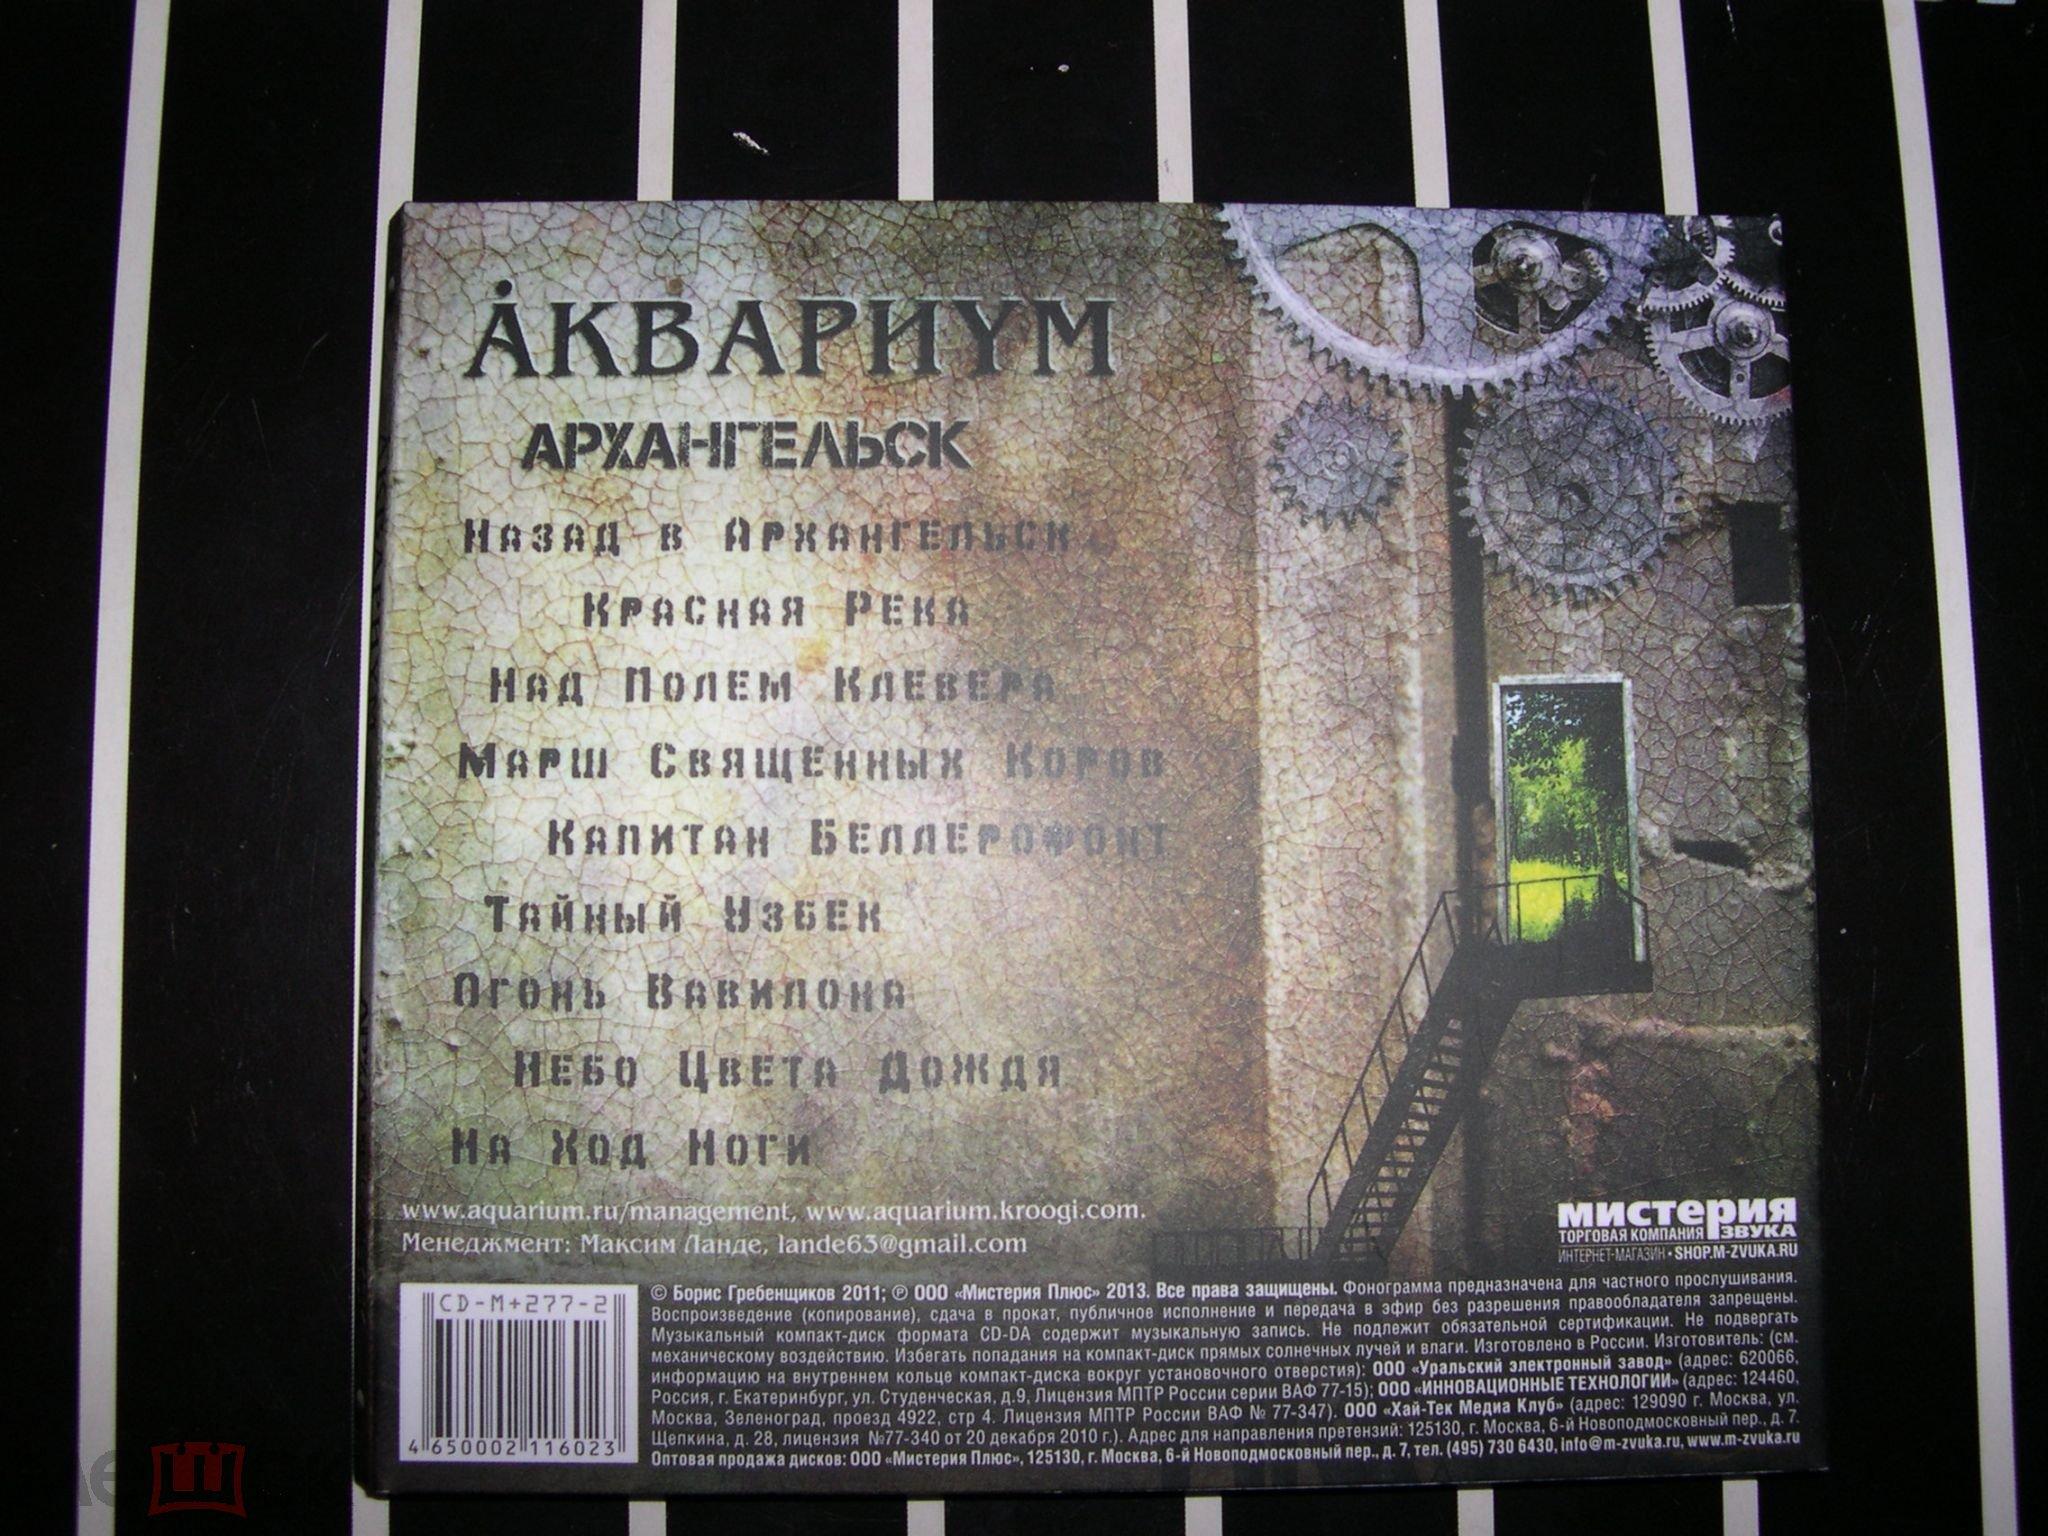 78fa594387ac Аквариум    Архангельск    Мистерия, 2013 CD-M+277-2